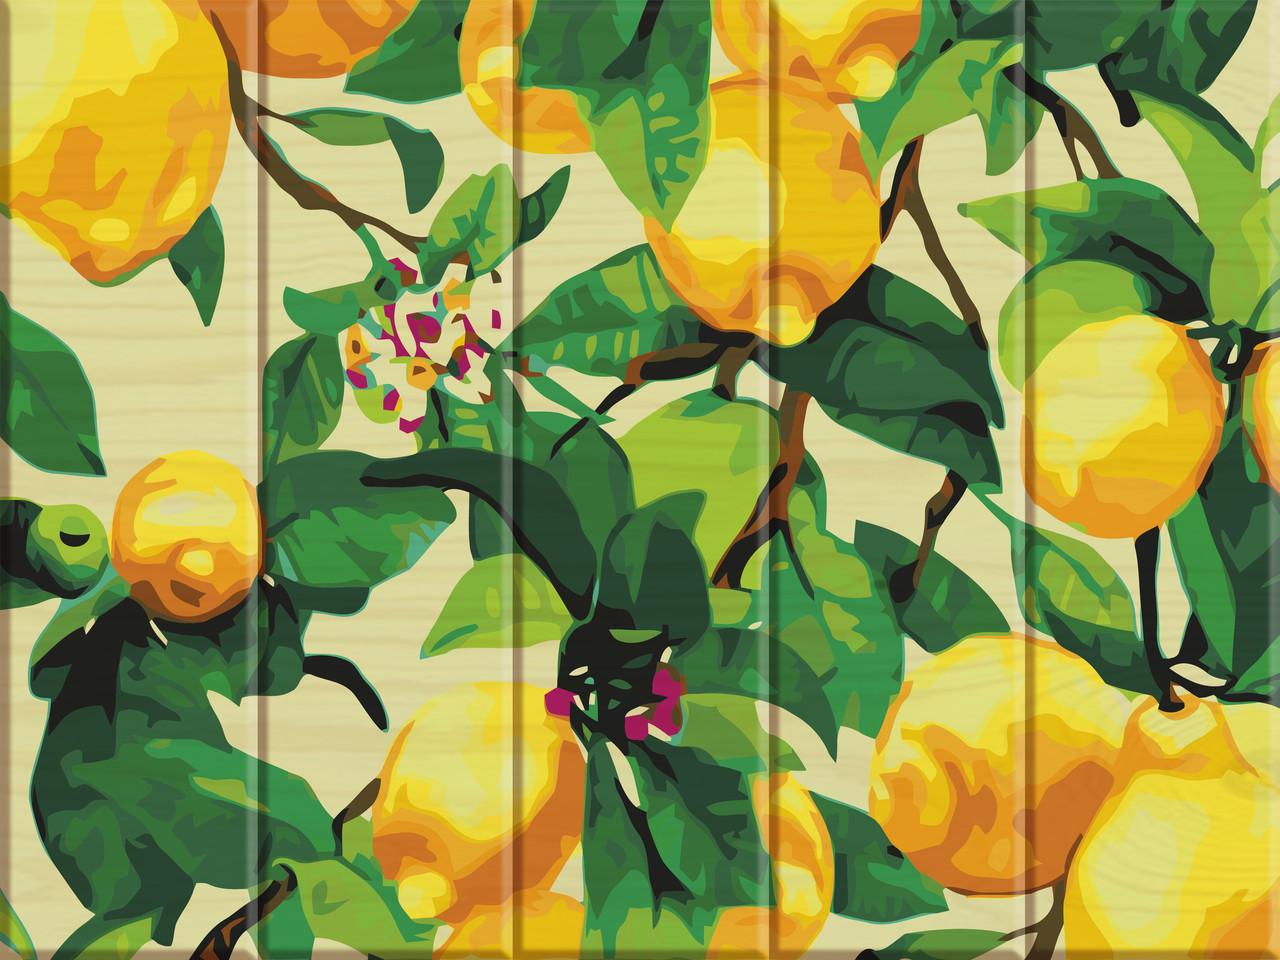 Картина по номерам Лимонне дерево, 30x40 см., Art Story